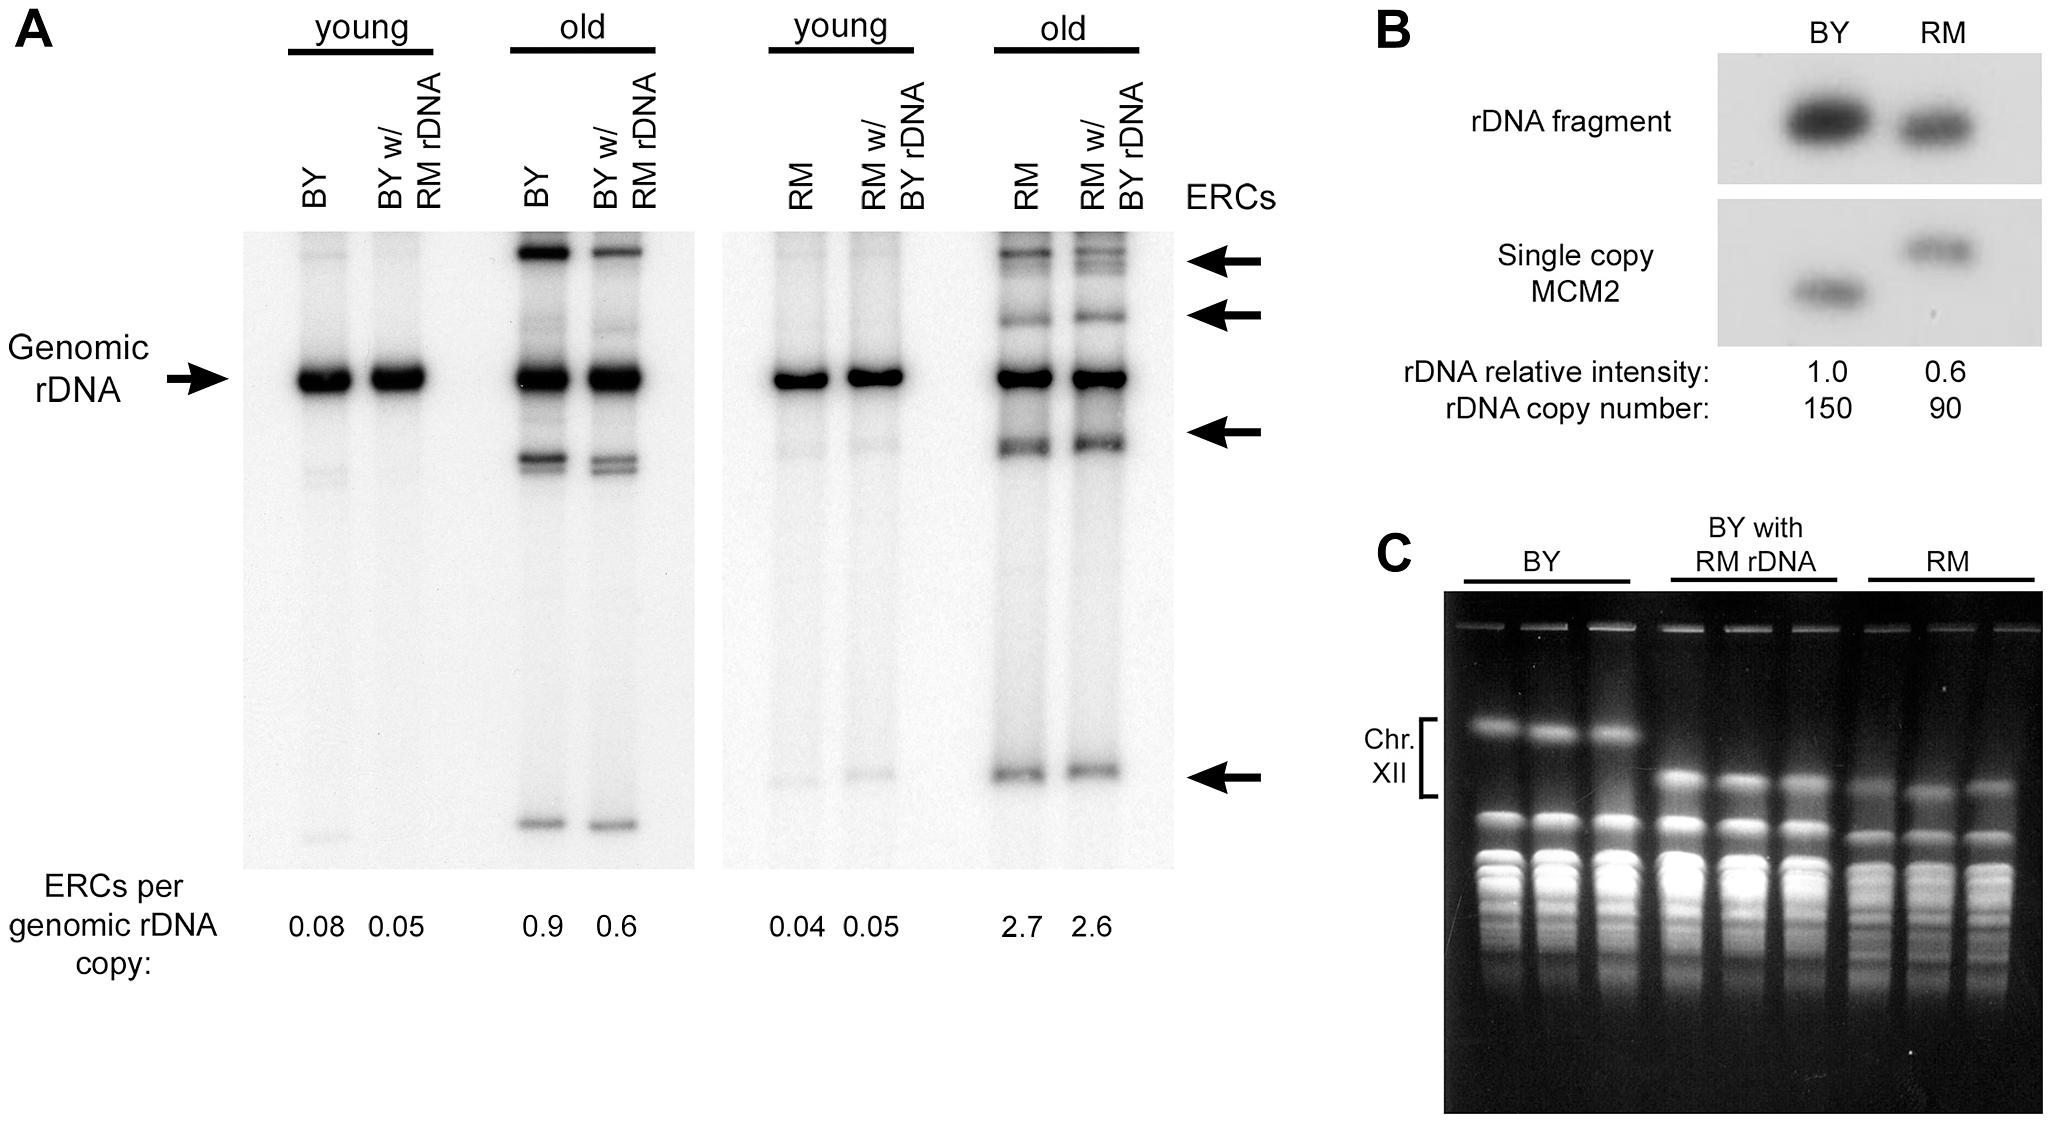 ERC abundance and rDNA copy number.